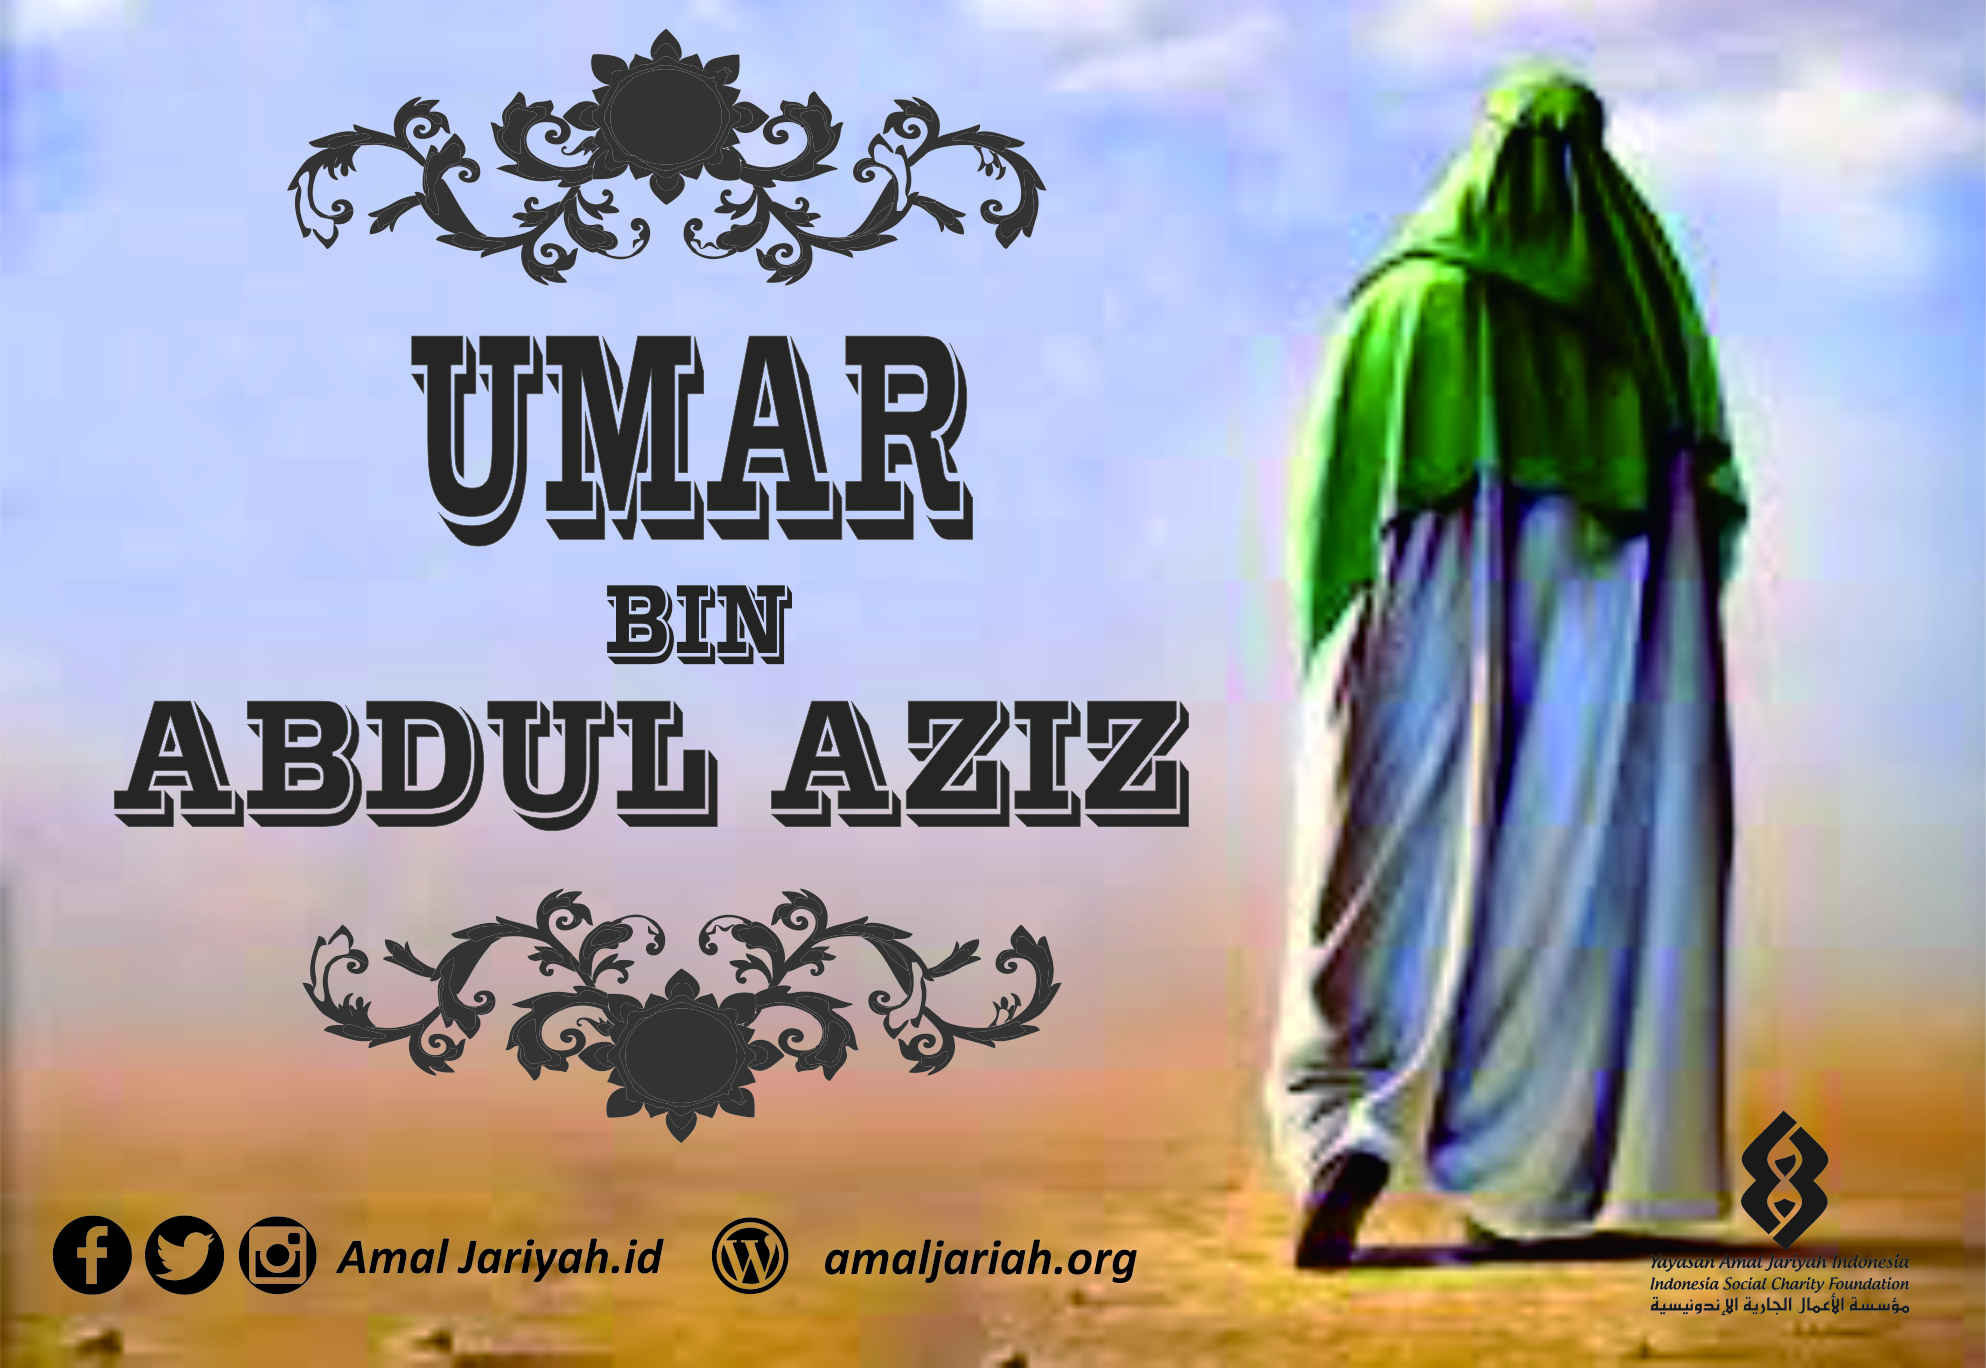 Hasil gambar untuk UMAR BIN ABDUL AZIZ